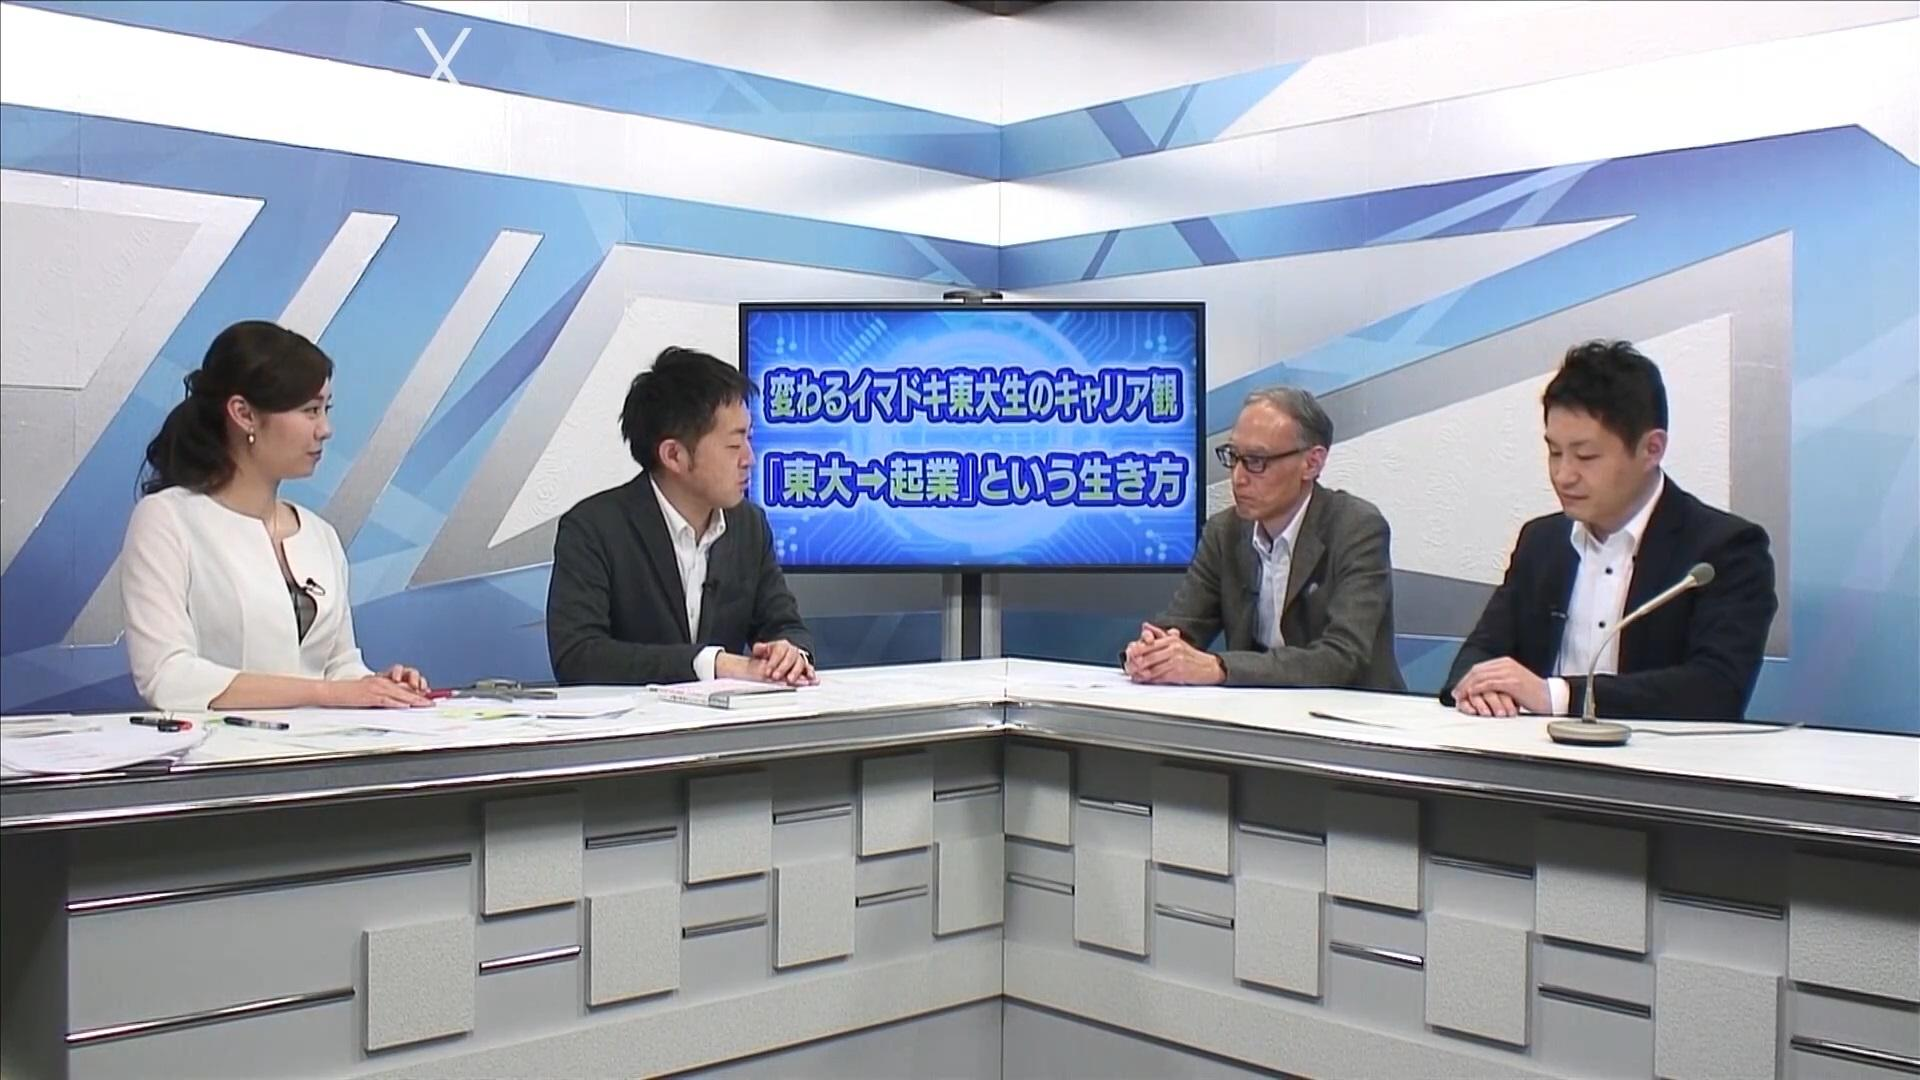 20180801_nikkeitlx04_15.jpg